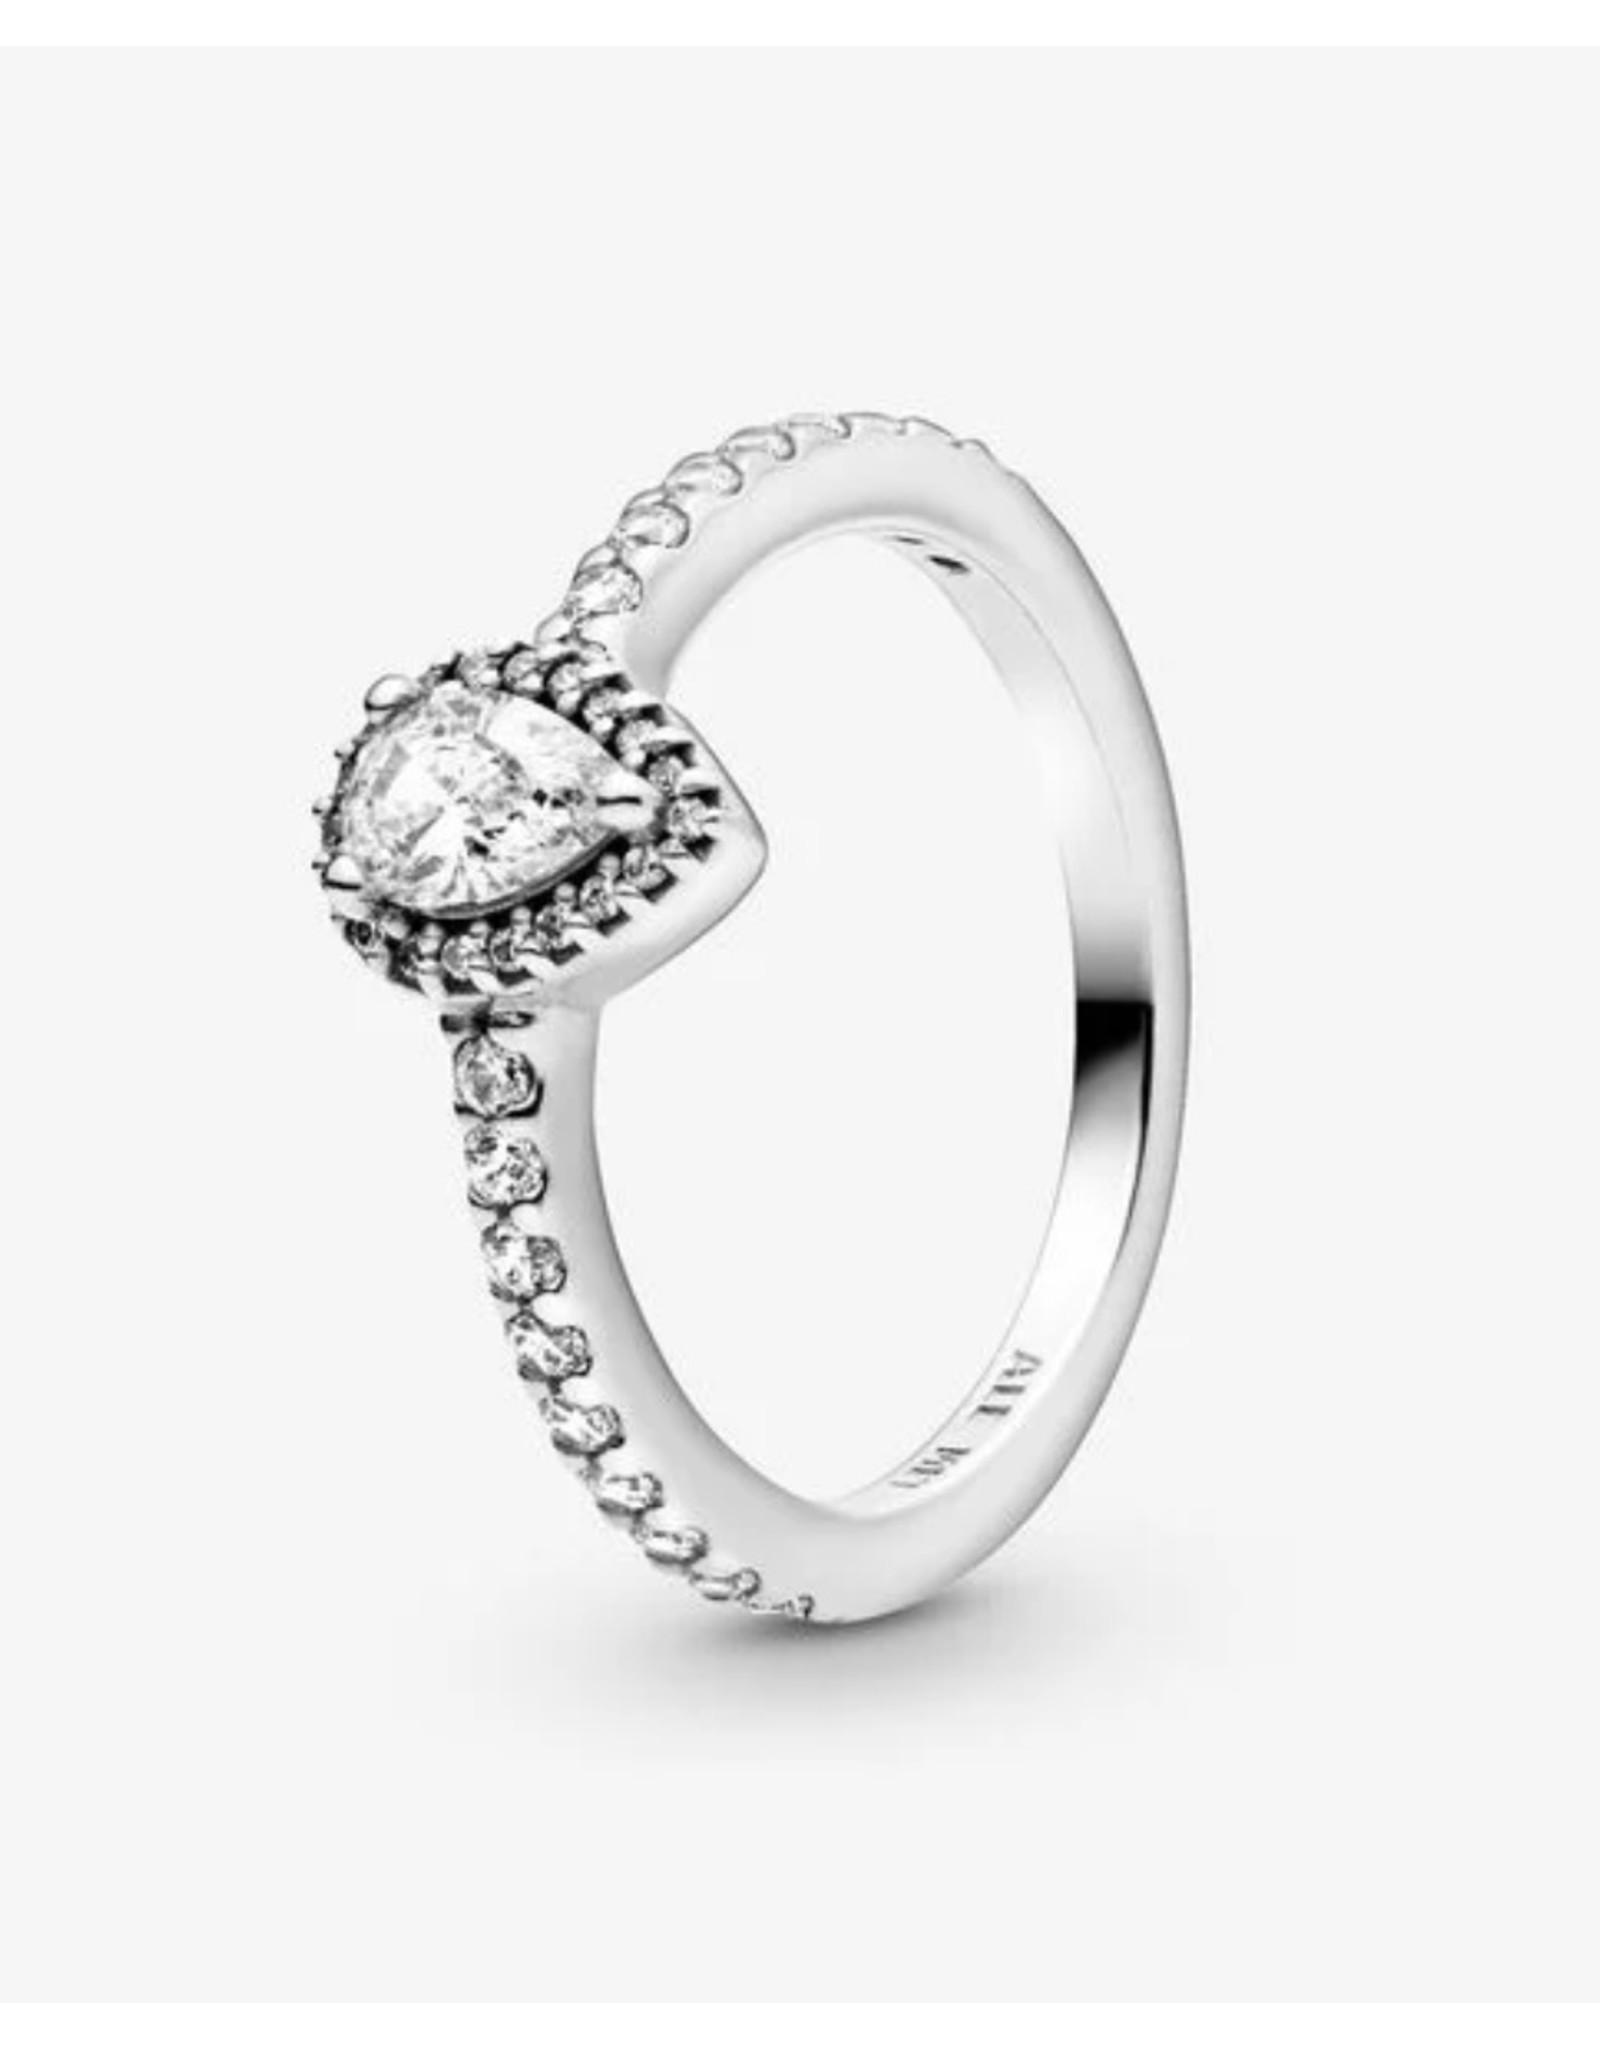 Pandora Pandora Ring,(196254CZ) Radiant Teardrop, Clear CZ